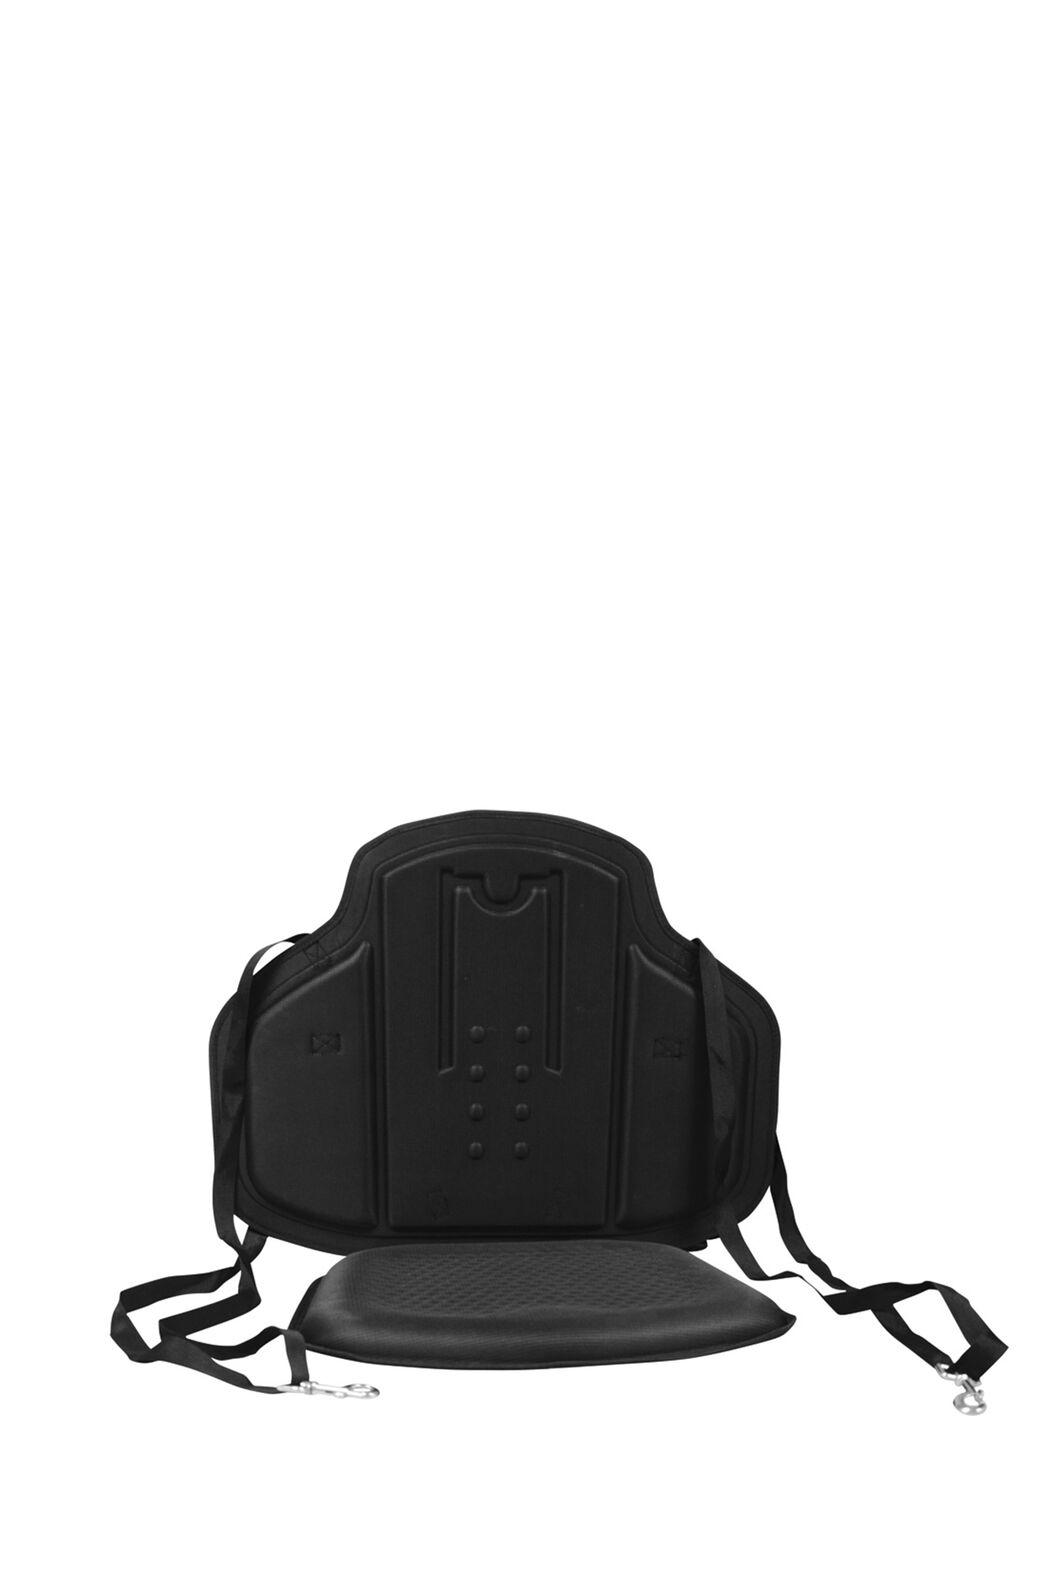 Tahwalhi ISUP Adjustable Seat, Black, hi-res